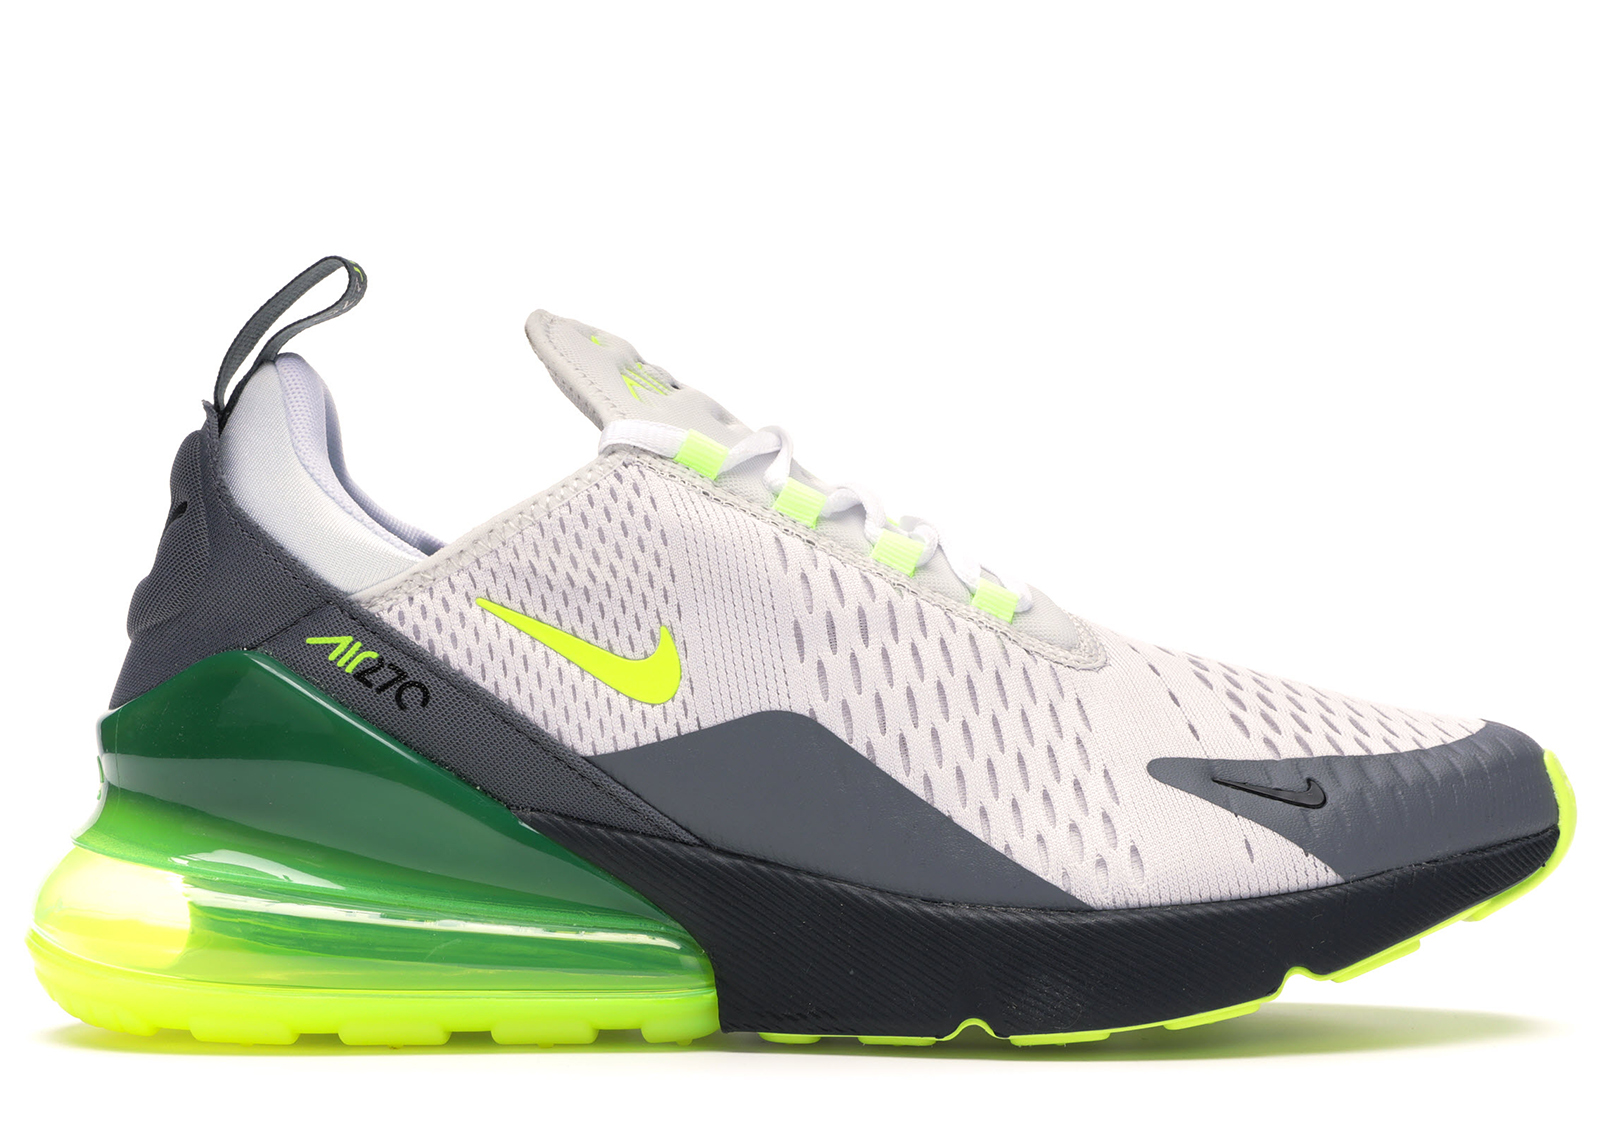 Nike Air Max 270 Platinum Volt - CJ0550-001